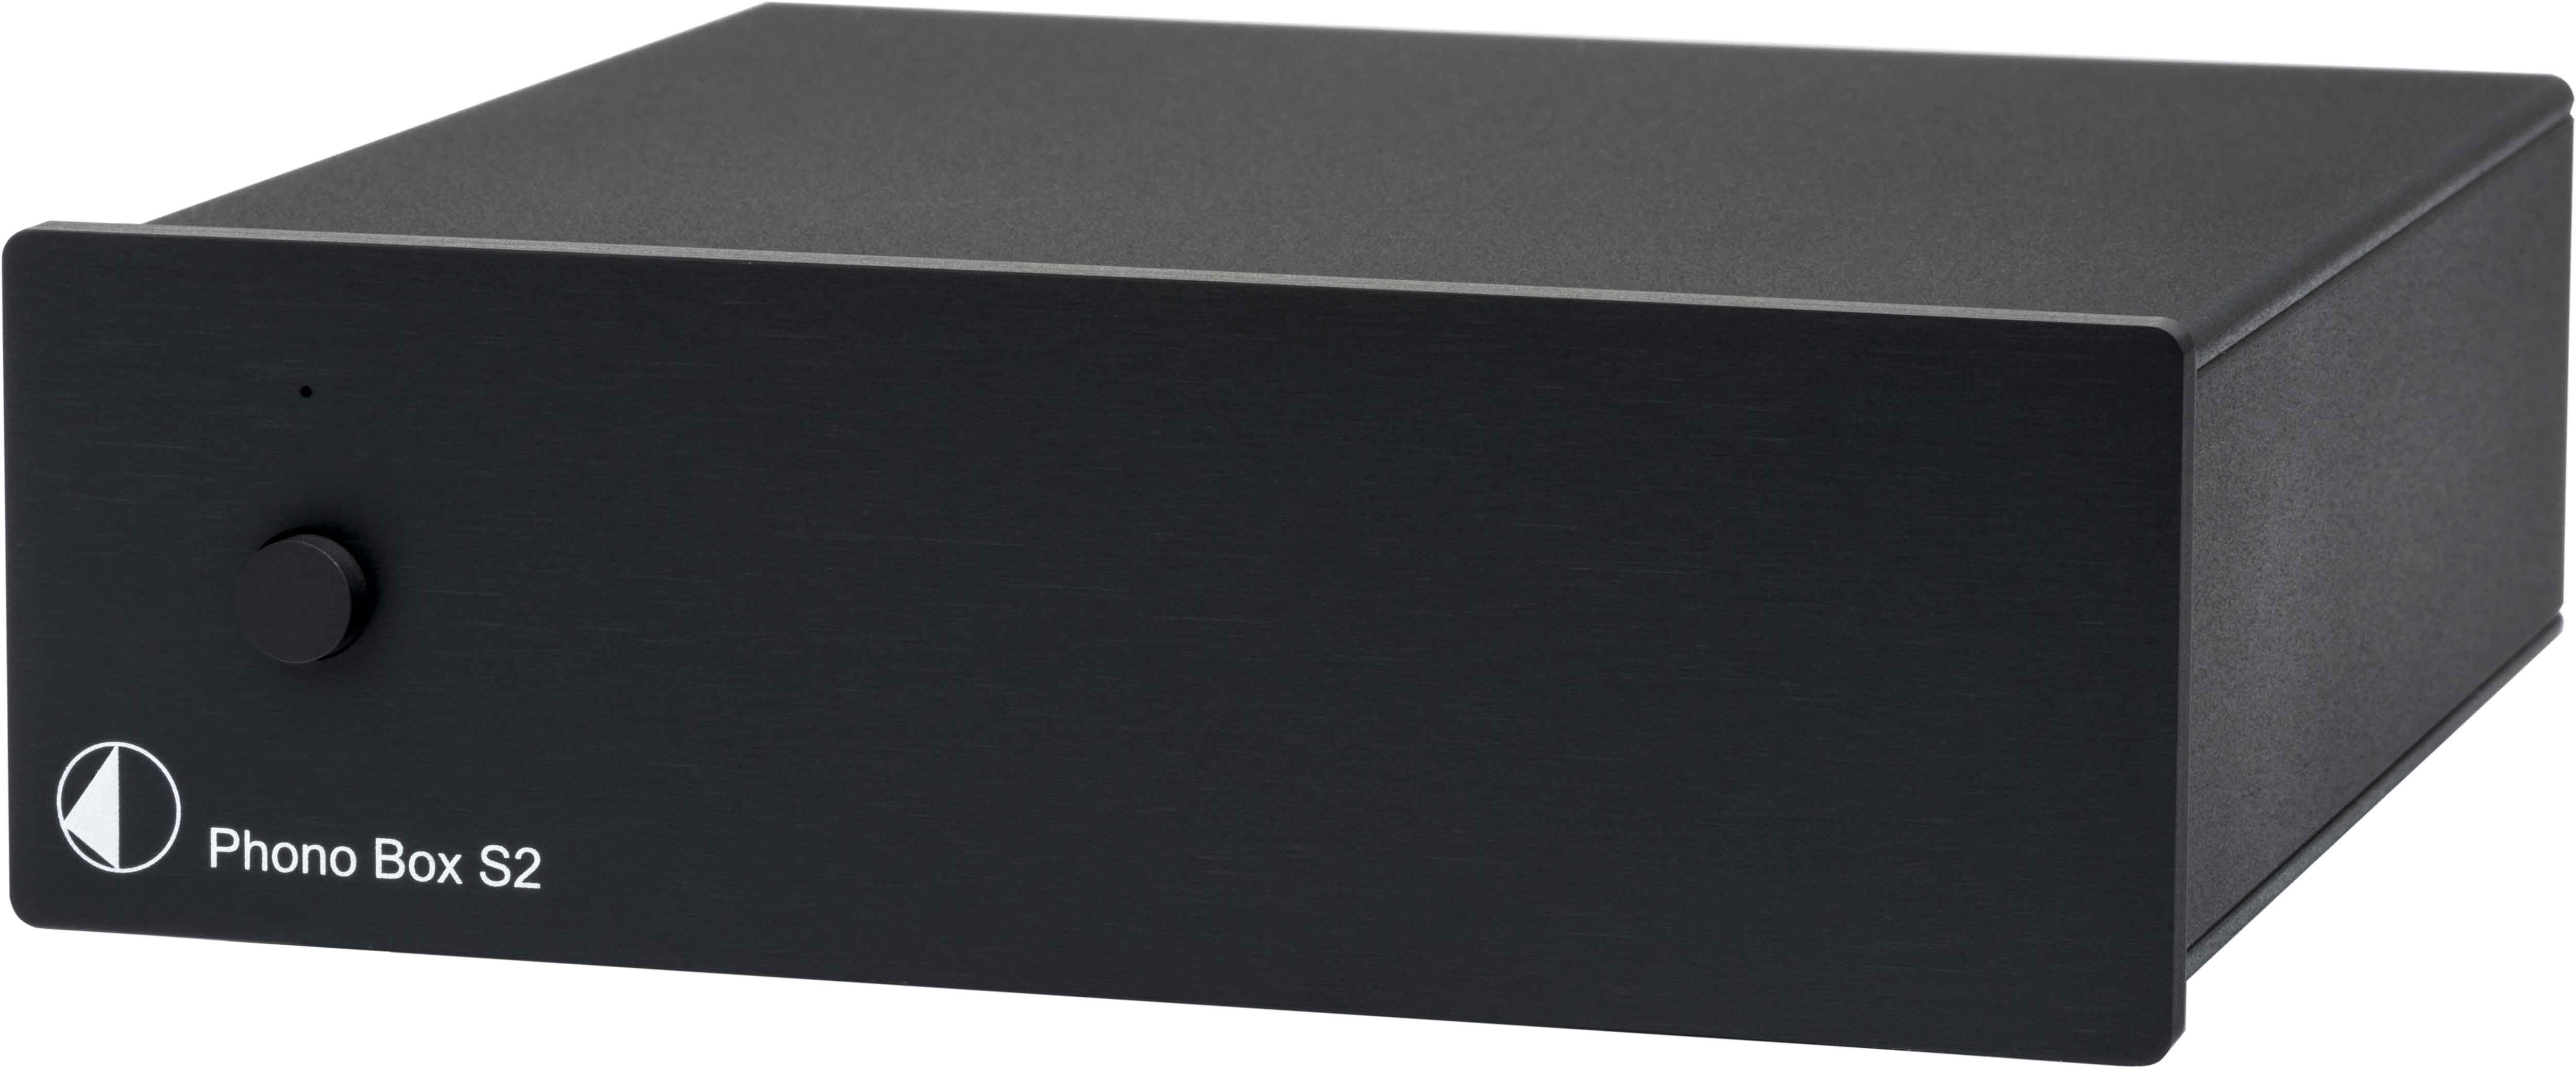 Pro-Ject Phono Box S2 RIAA-esivahvistin levysoittimelle